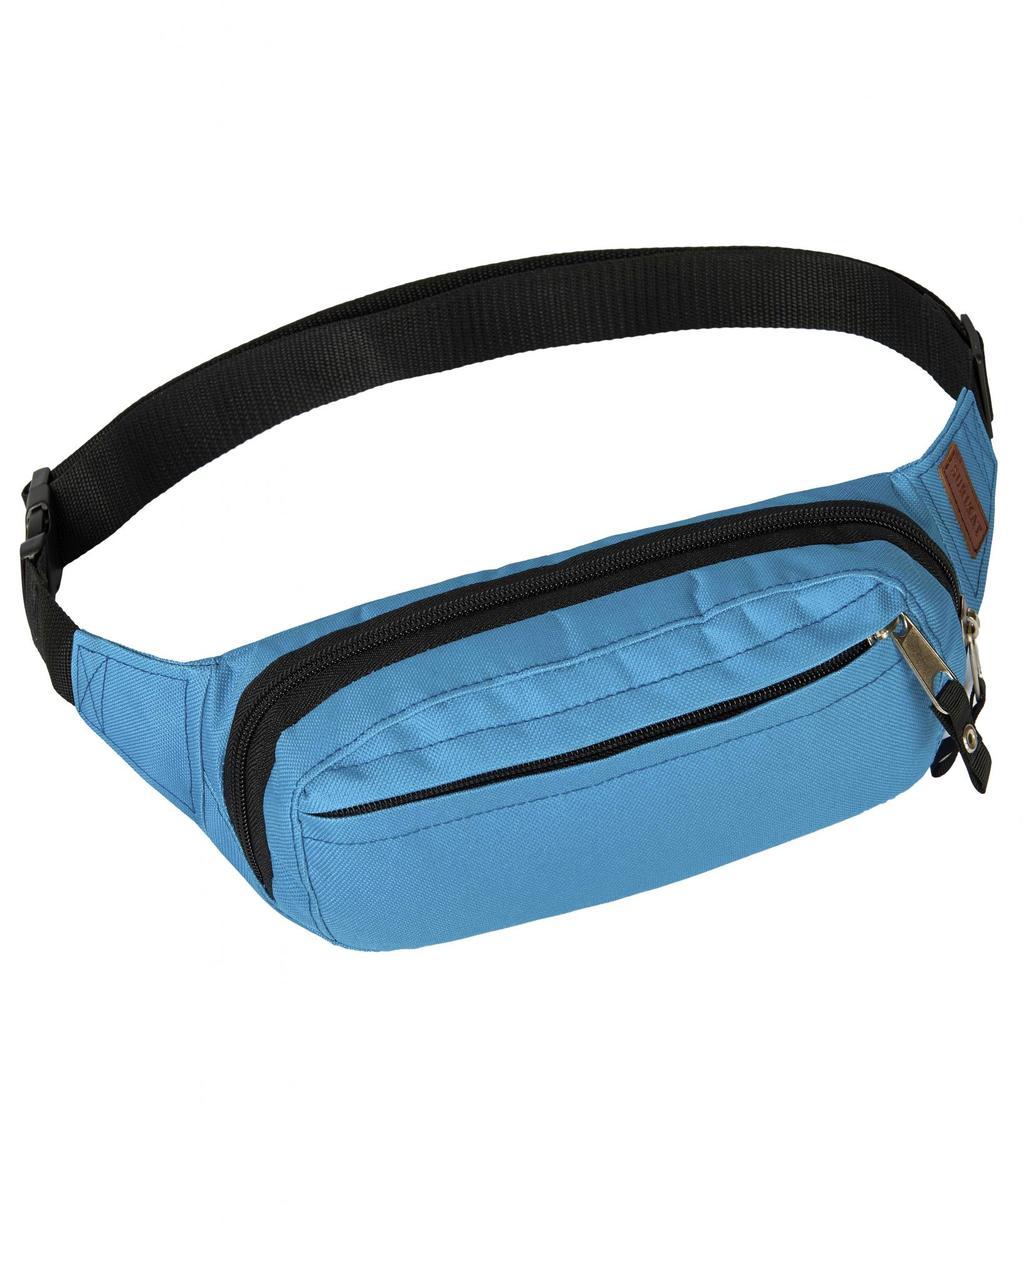 946082832ab0 Поясная сумка голубая Primo Surikat (бананка, сумка на пояс) - Інтернет  магазин BANZAK